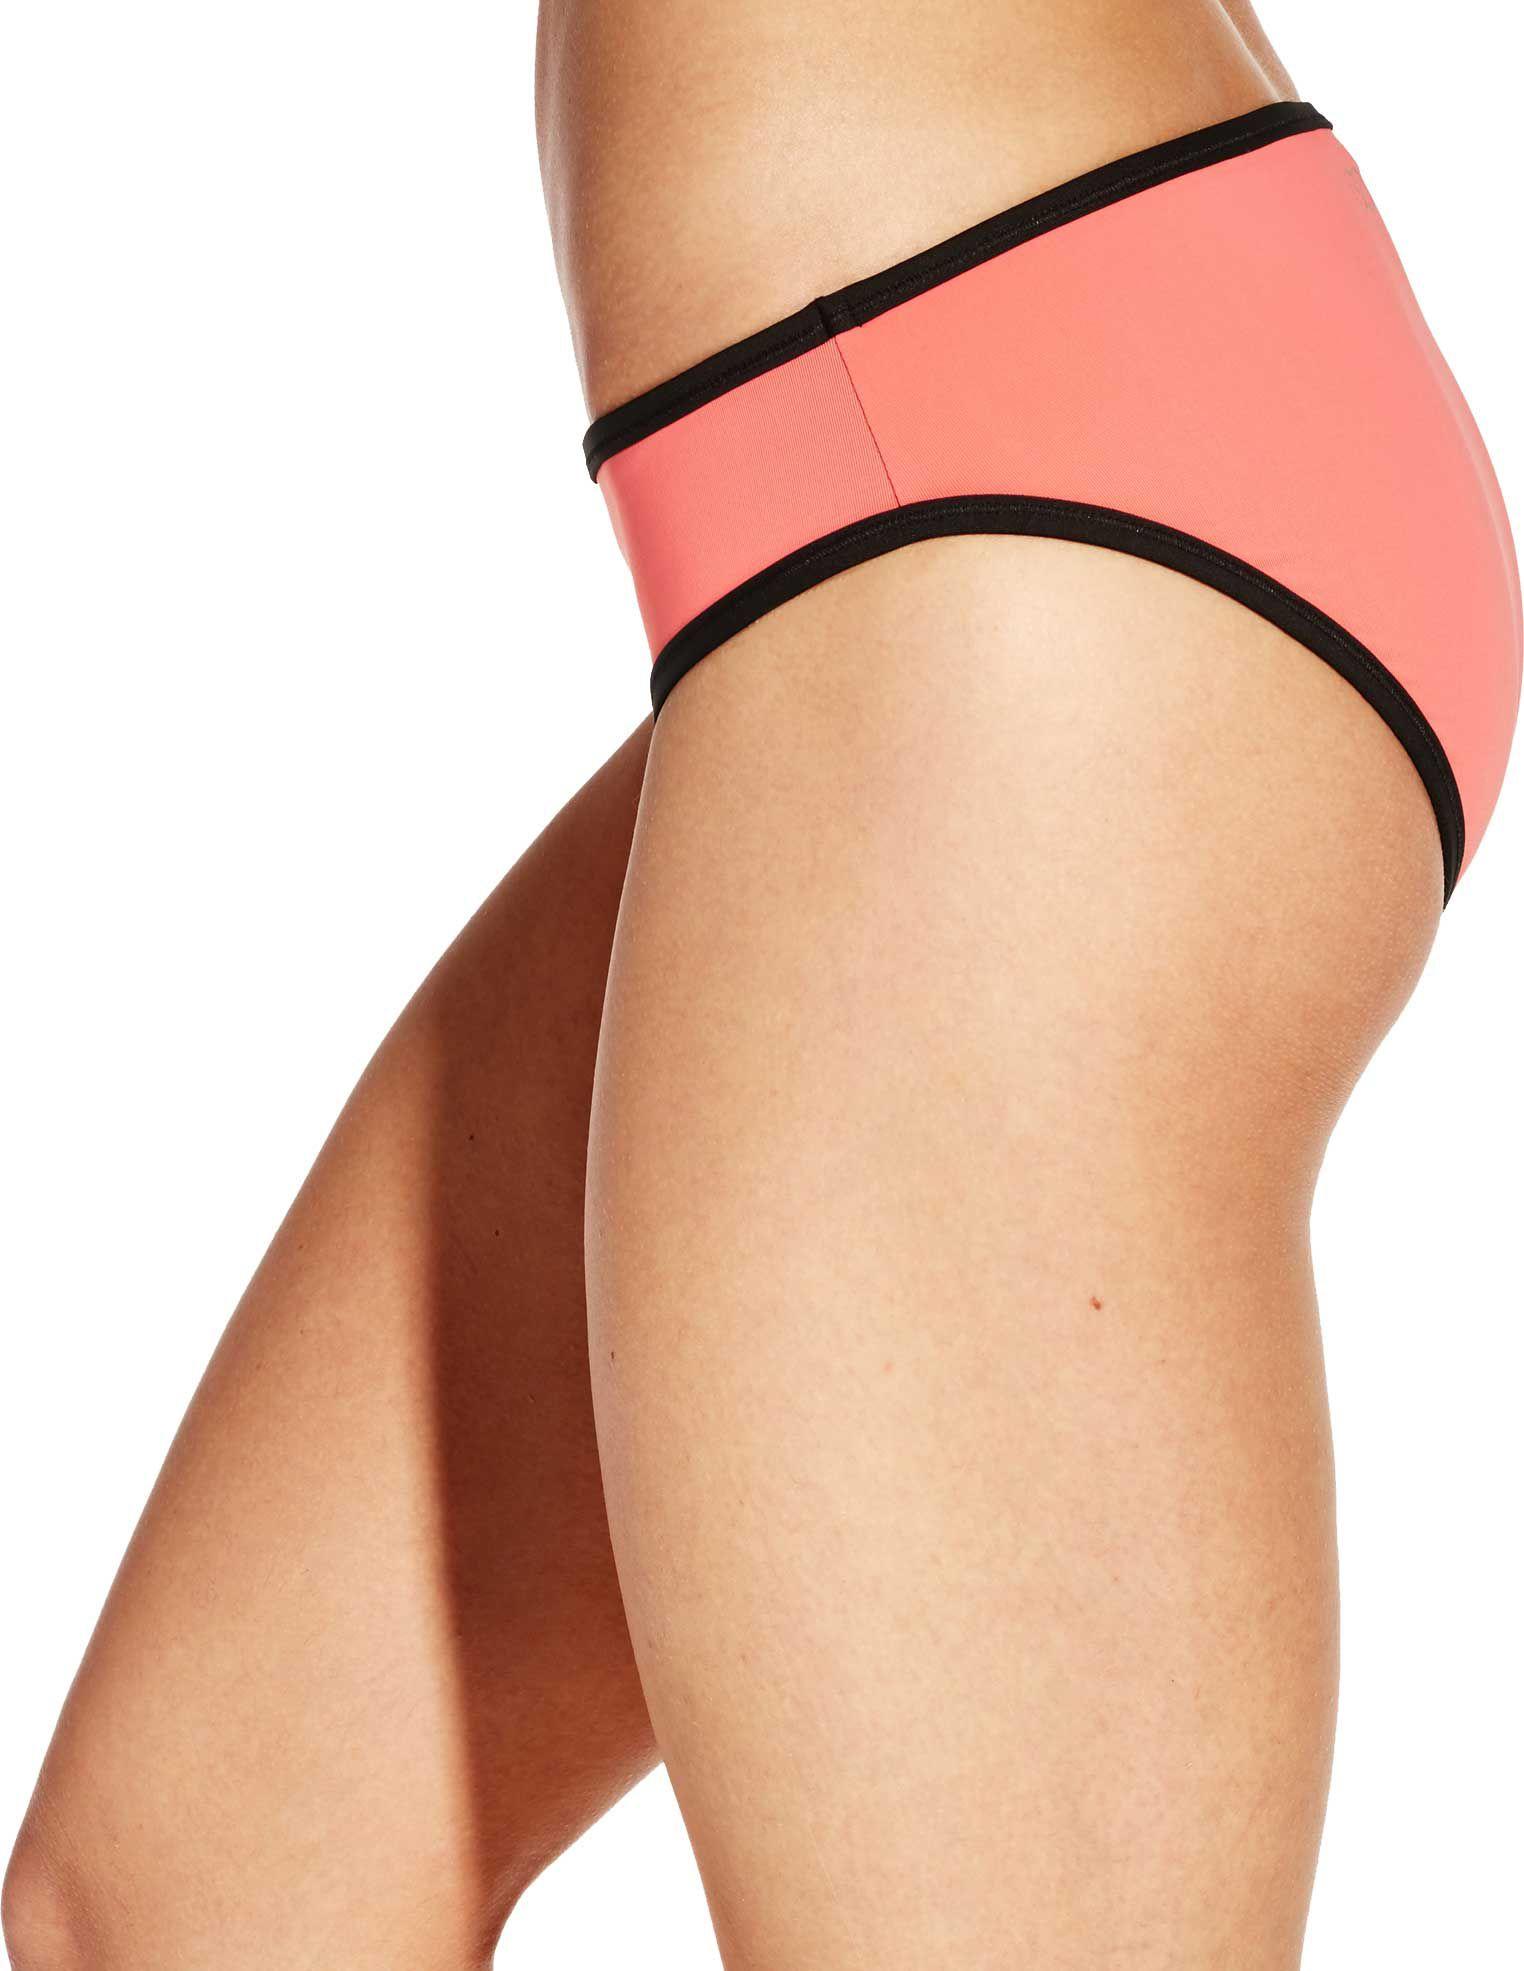 Banded bikini bottoms